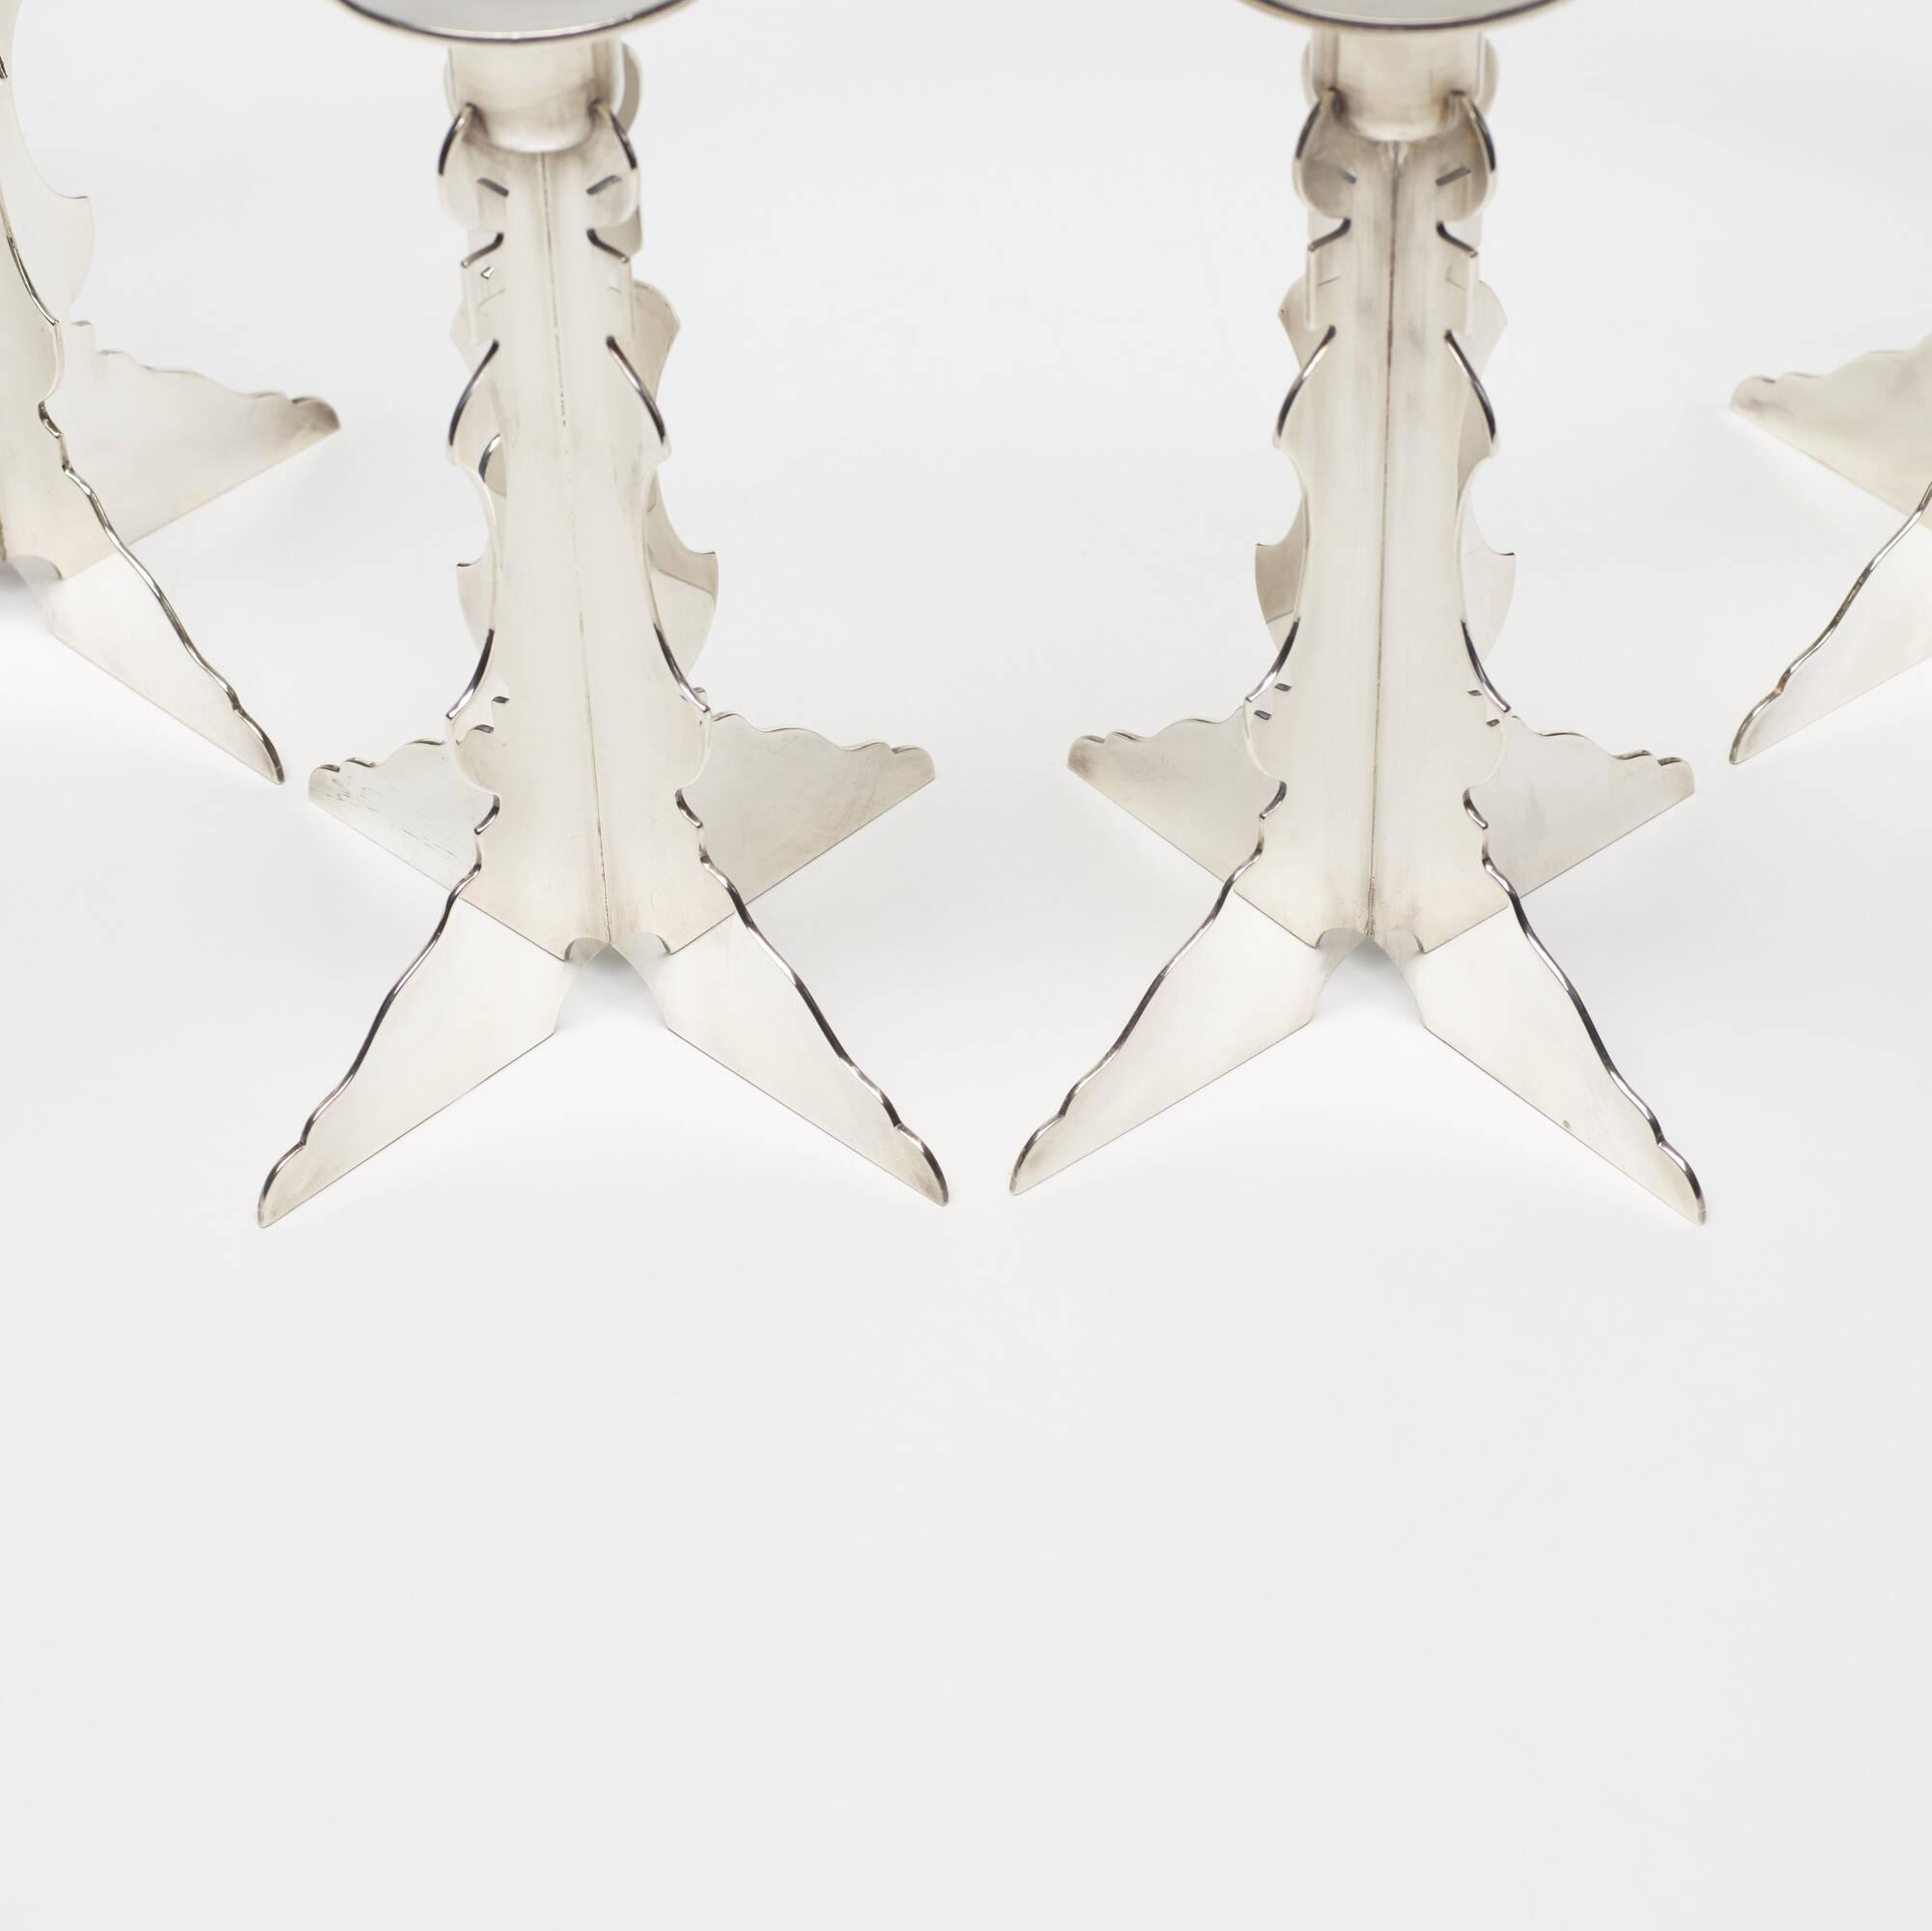 217: Robert Venturi with Denise Scott Brown / candlesticks, set of six (3 of 3)